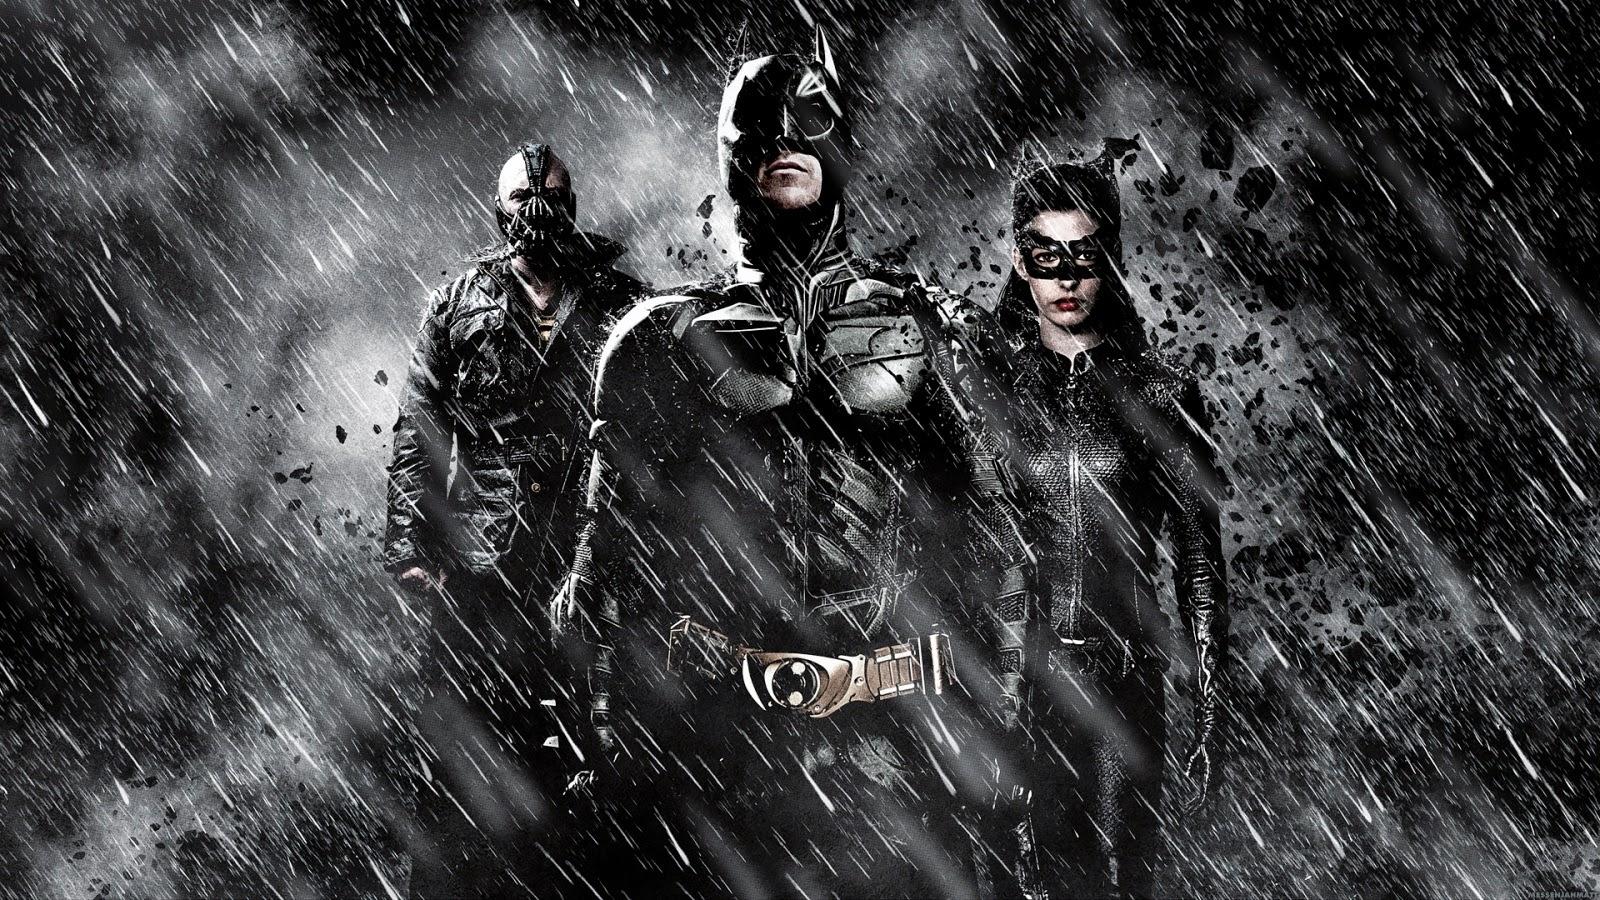 Bane Wallpaper Dark Knight Rises Hd 1080wallpaperhd